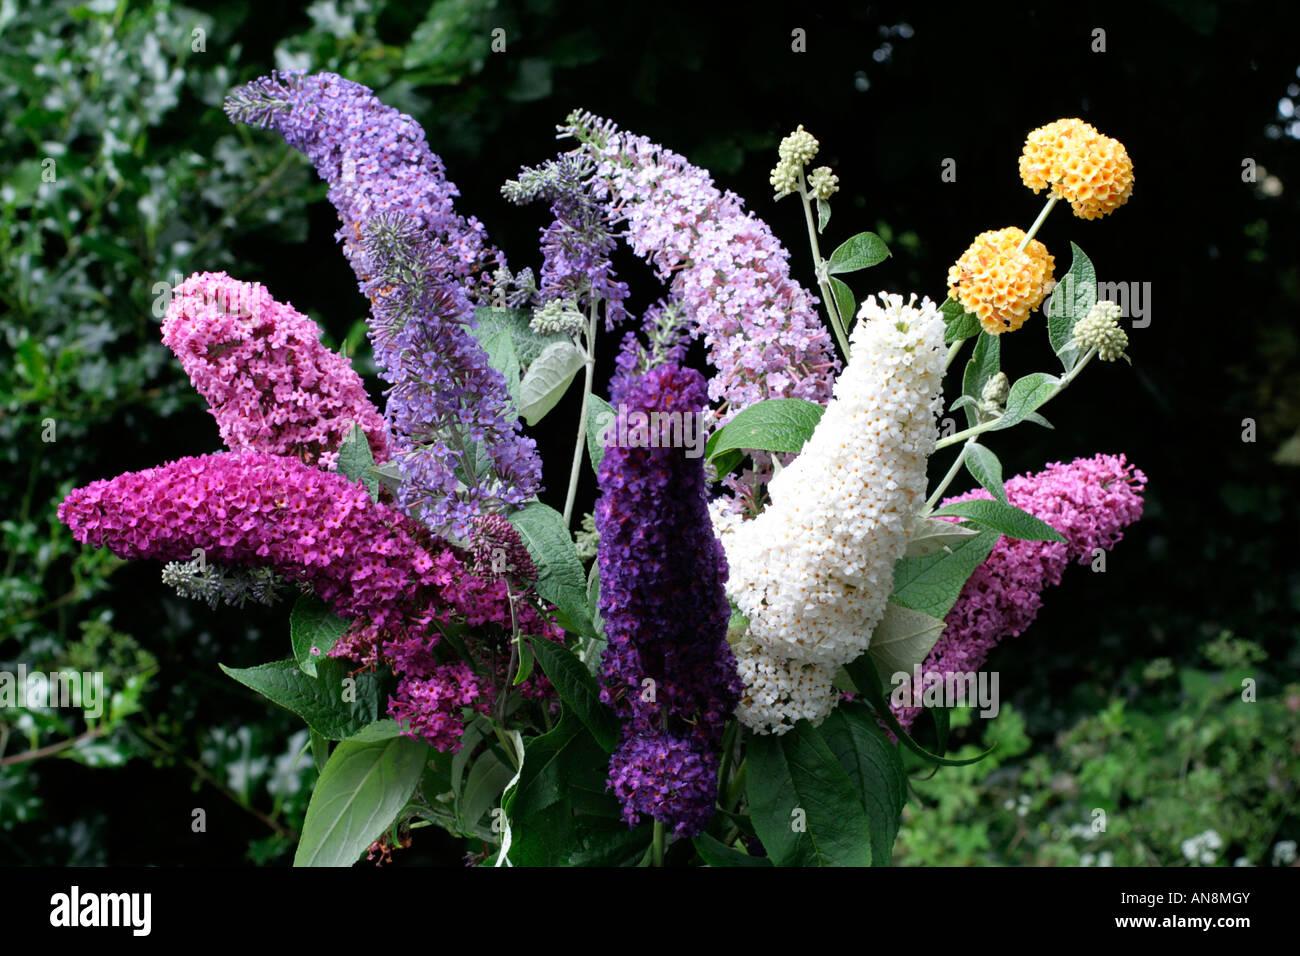 Buddleja Davidii Cultivars Stock Photo Royalty Free Image